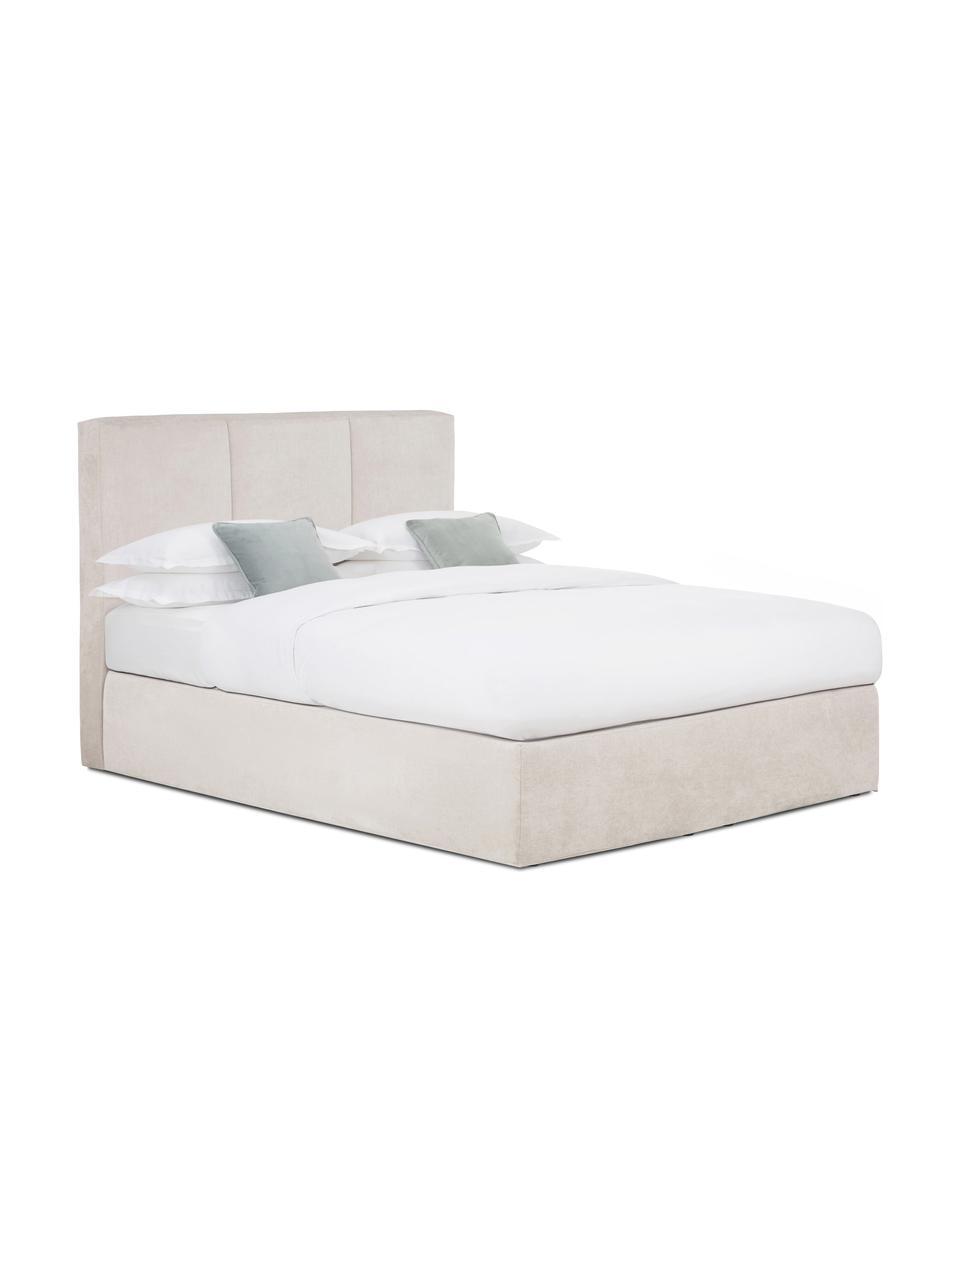 Boxspring bed Oberon in donkere beige, Matras: 5-zones pocketvering, Poten: kunststof, Stof donker beige, 200 x 200 cm